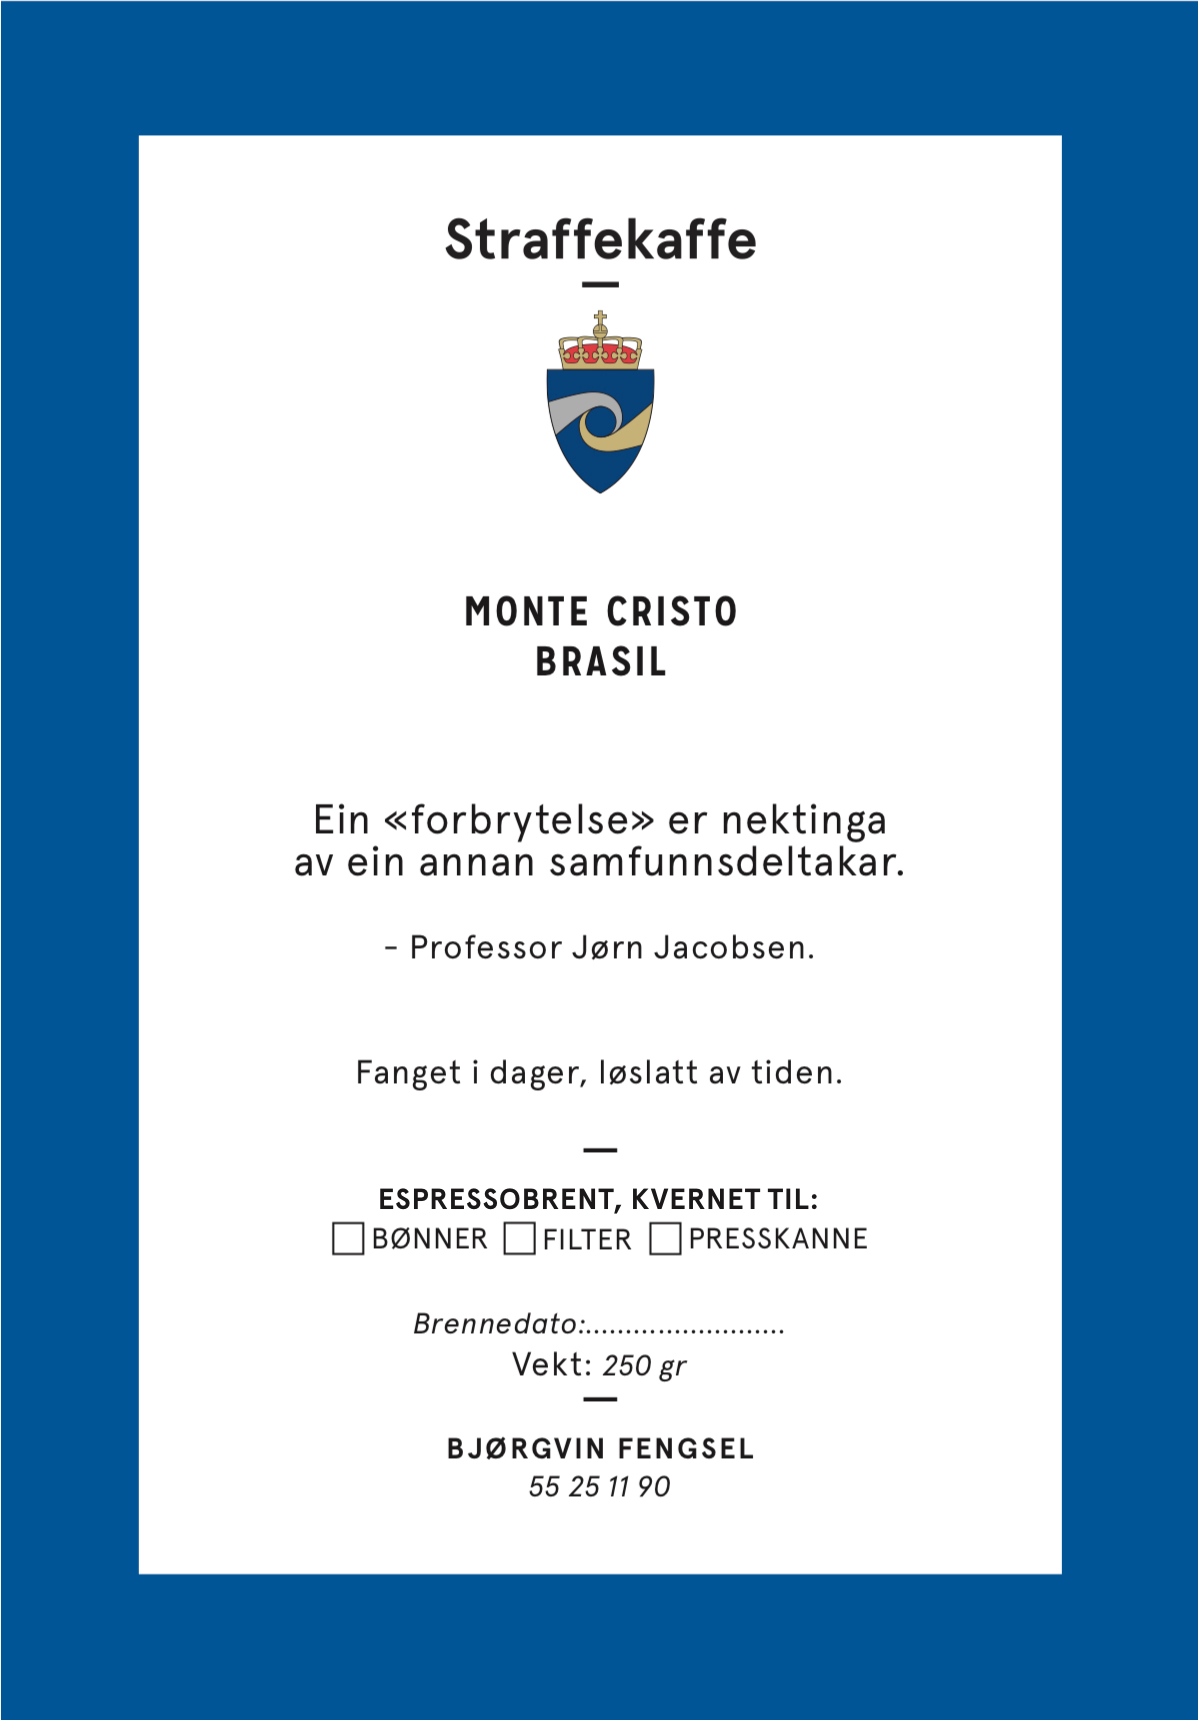 Monte Cristo Brasil Esp.